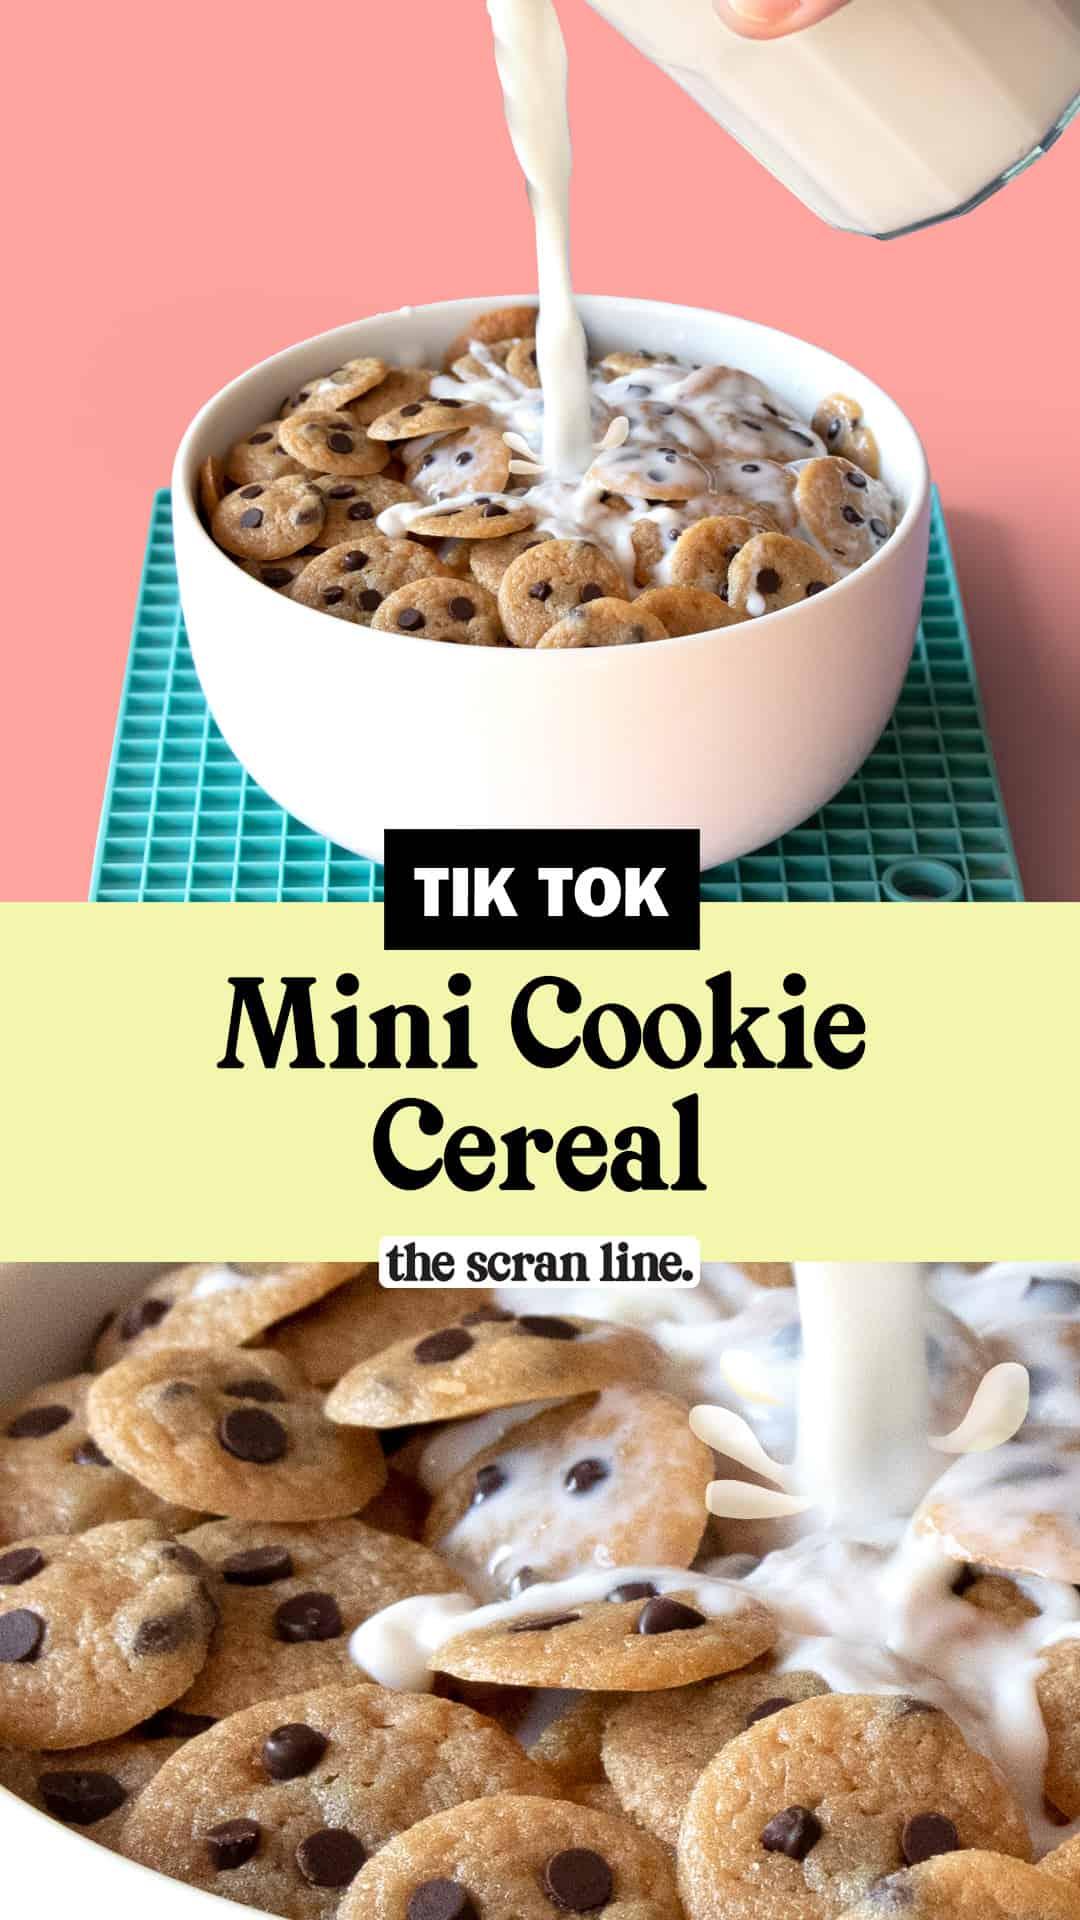 Pinterest image for Tik Tok Mini Cookie Cereal.